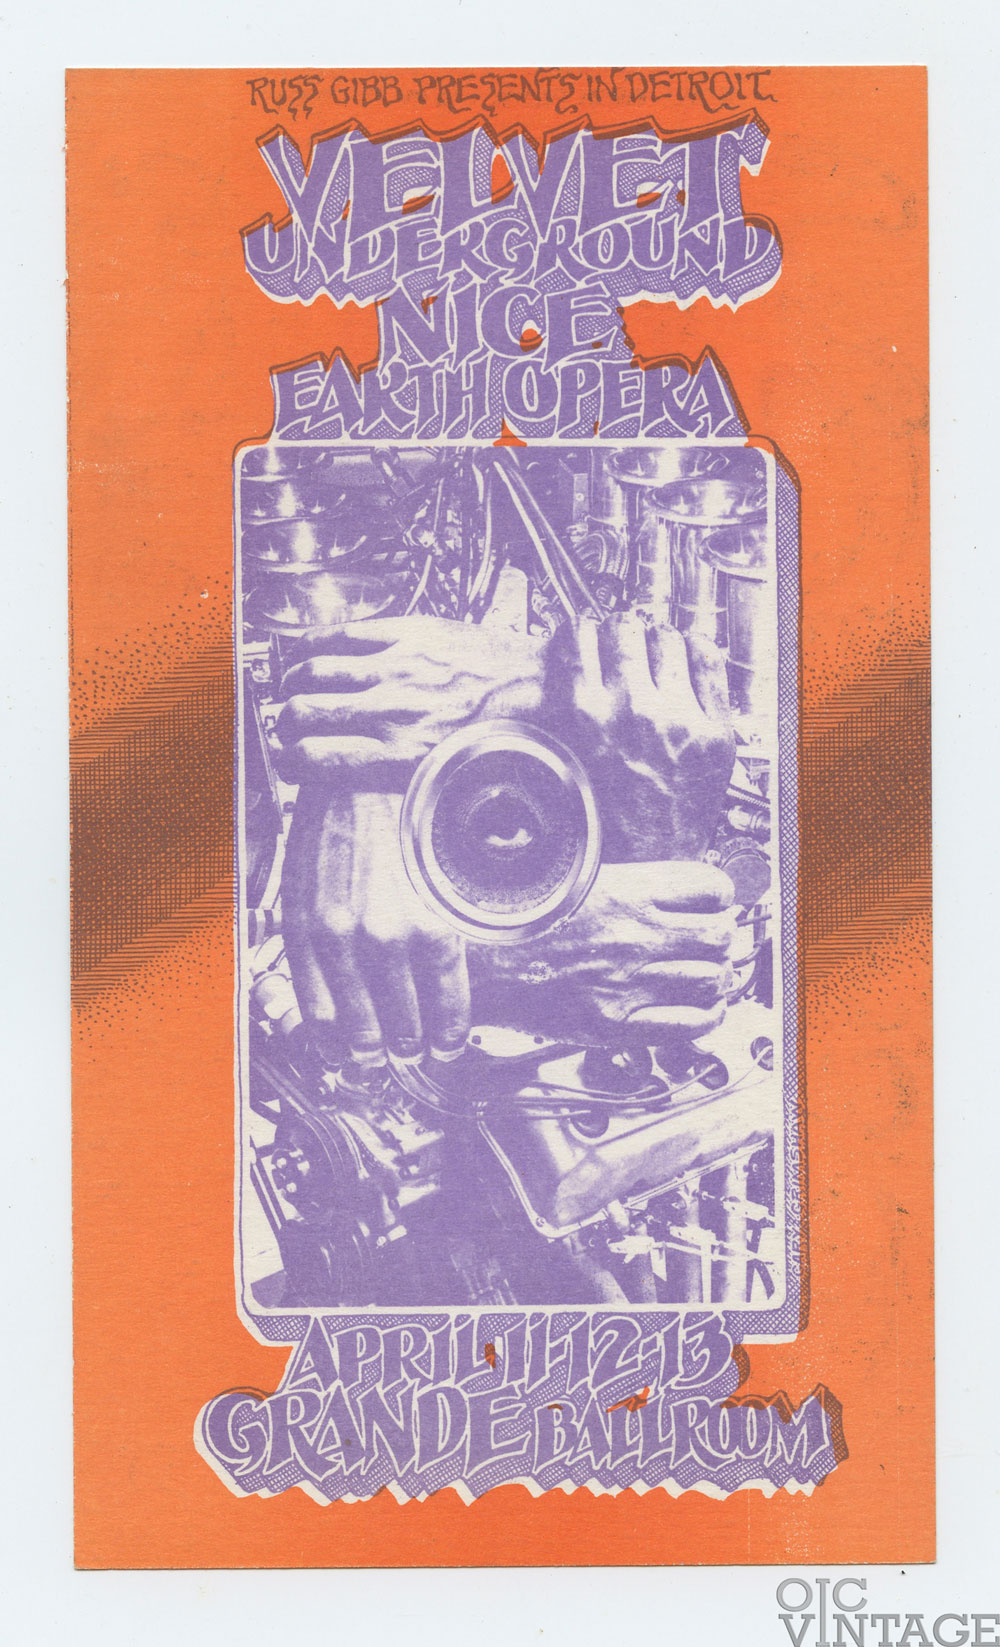 Grande Ballroom Postcard 1969 Apr 11 Velvet Underground Earth Opera